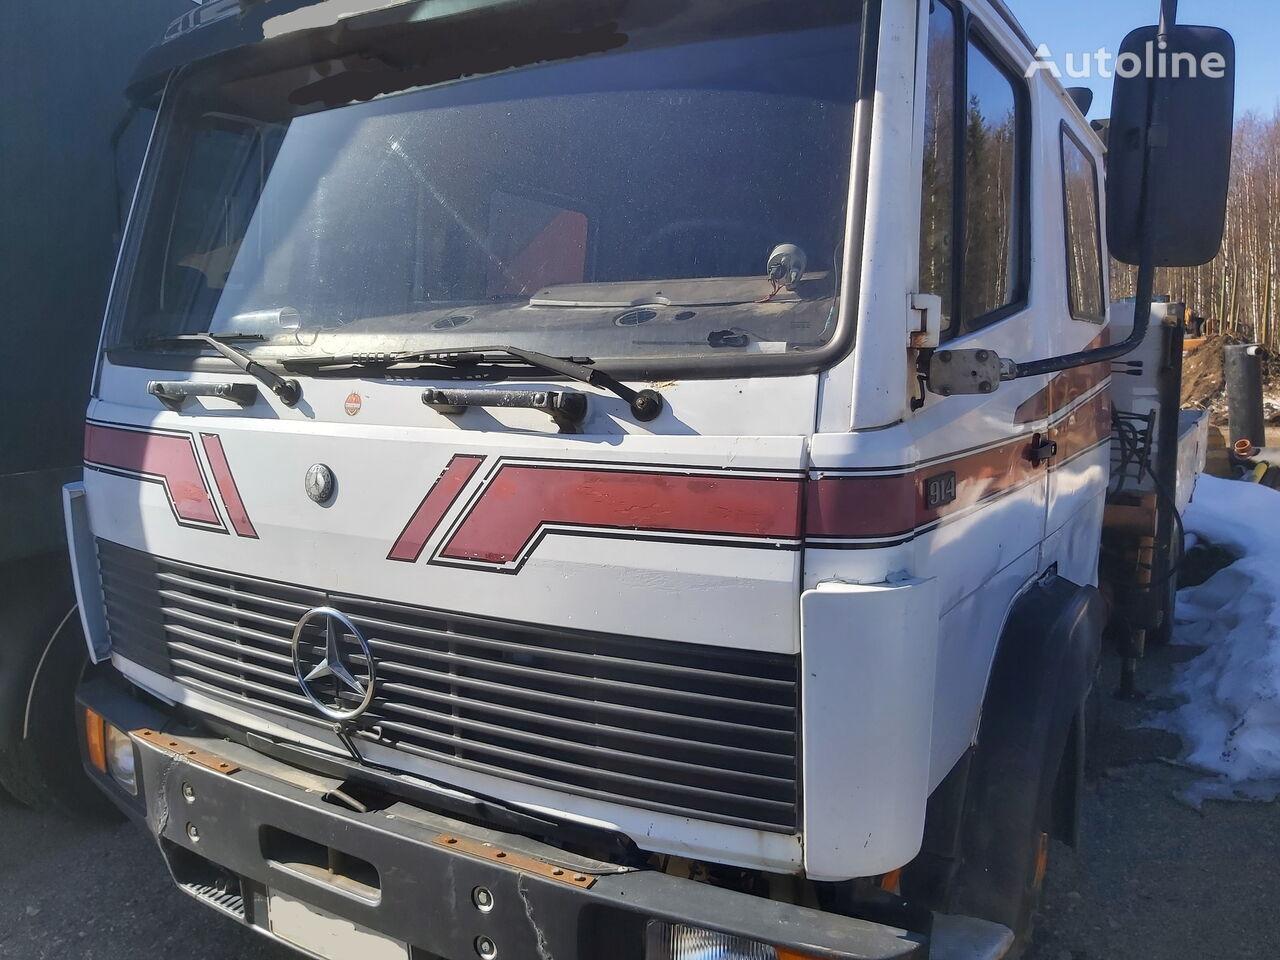 MERCEDES-BENZ 914 with Ferrari 500 crane flatbed truck